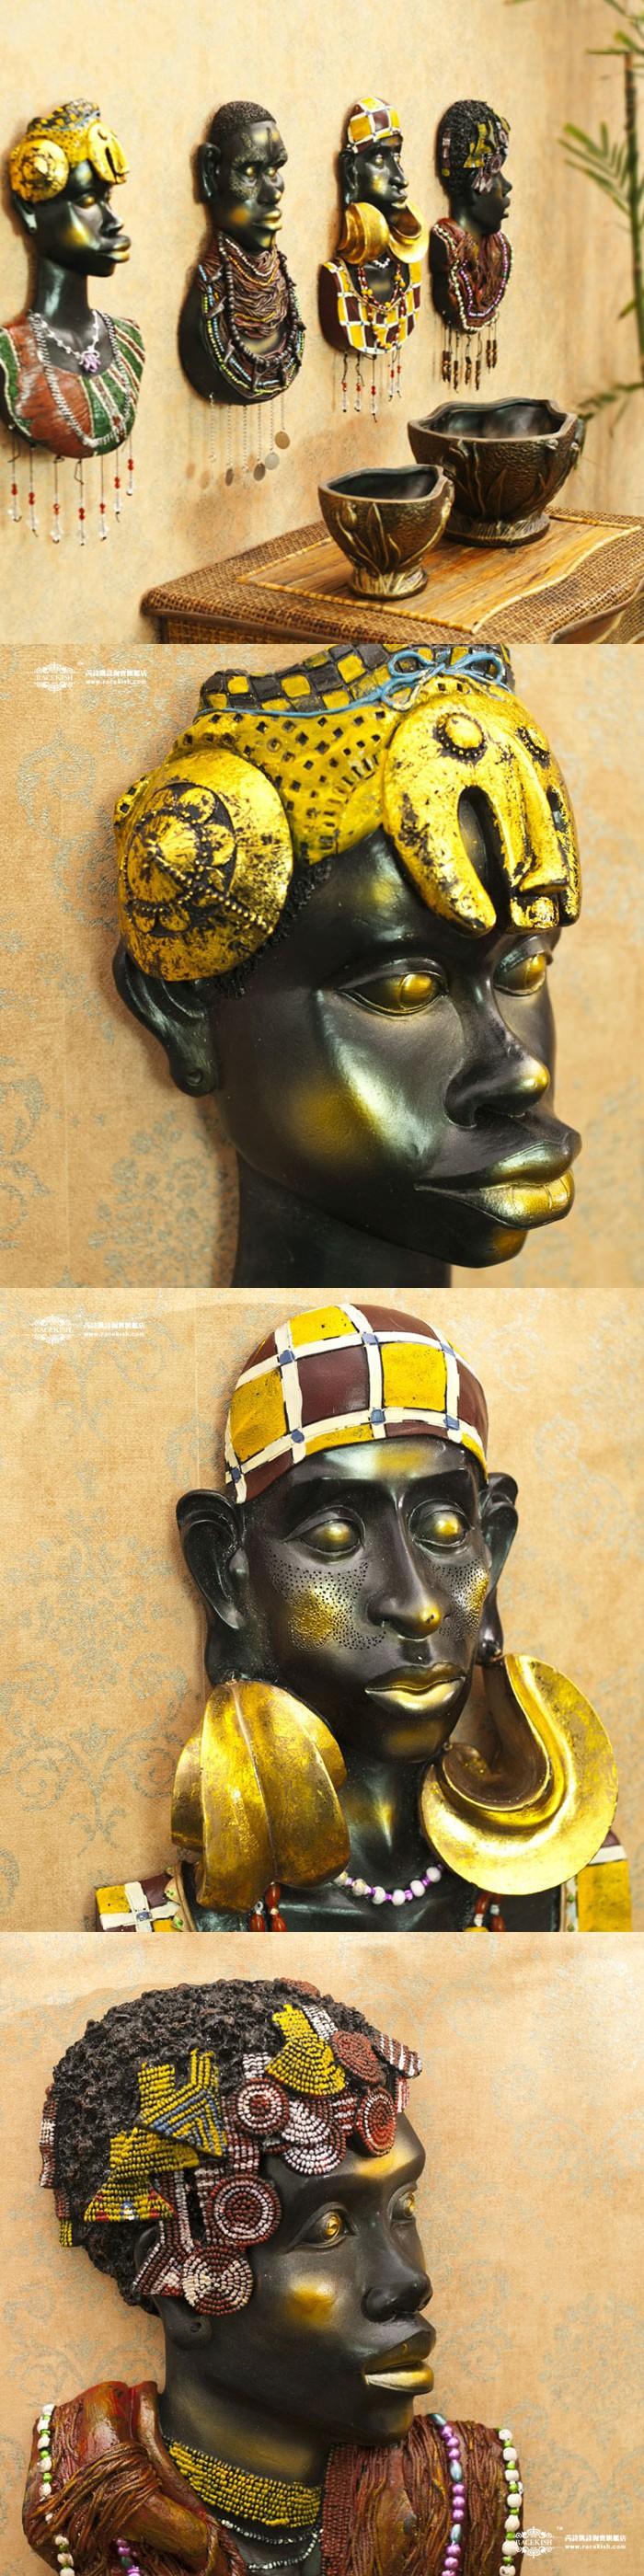 Africa earthsongs resin portrait mural creative wall hanging ...